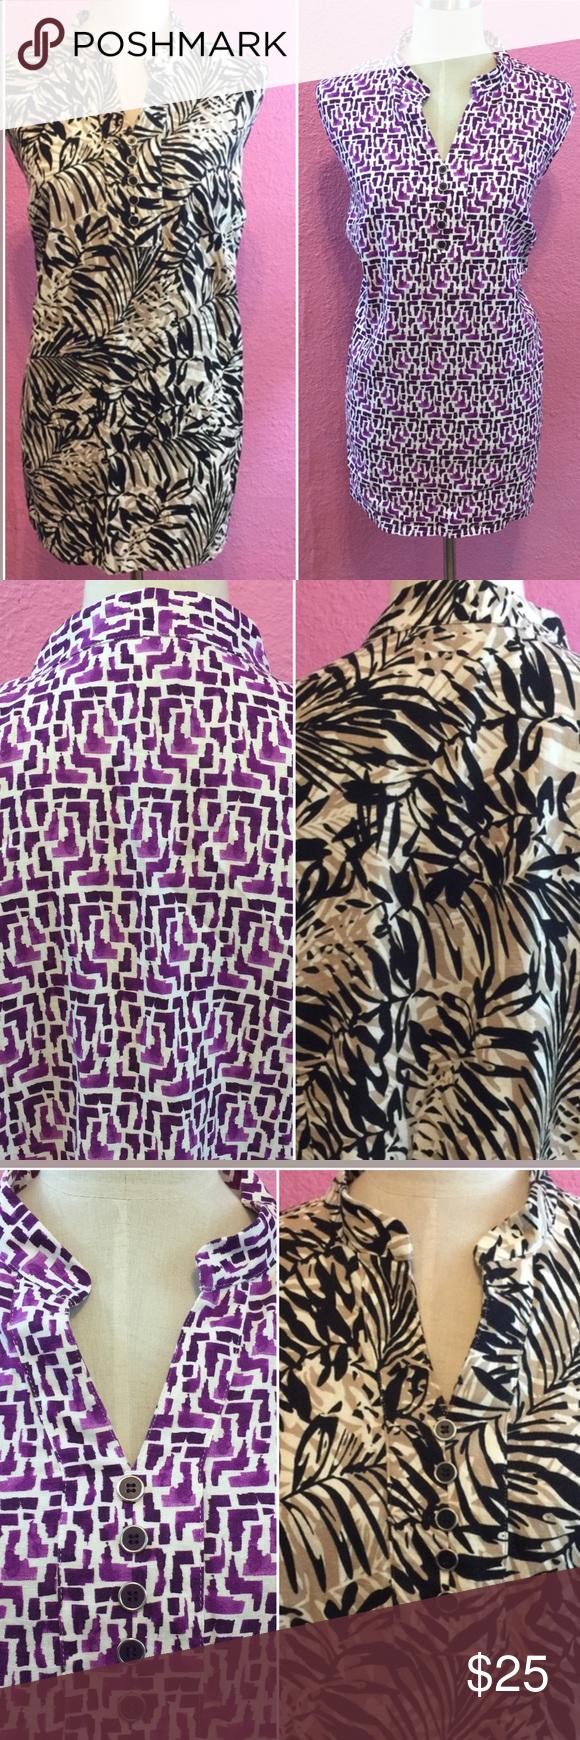 Plus size shirt bundle 2xl Plus size shirt bundle 2xl CJ Banks  Tops